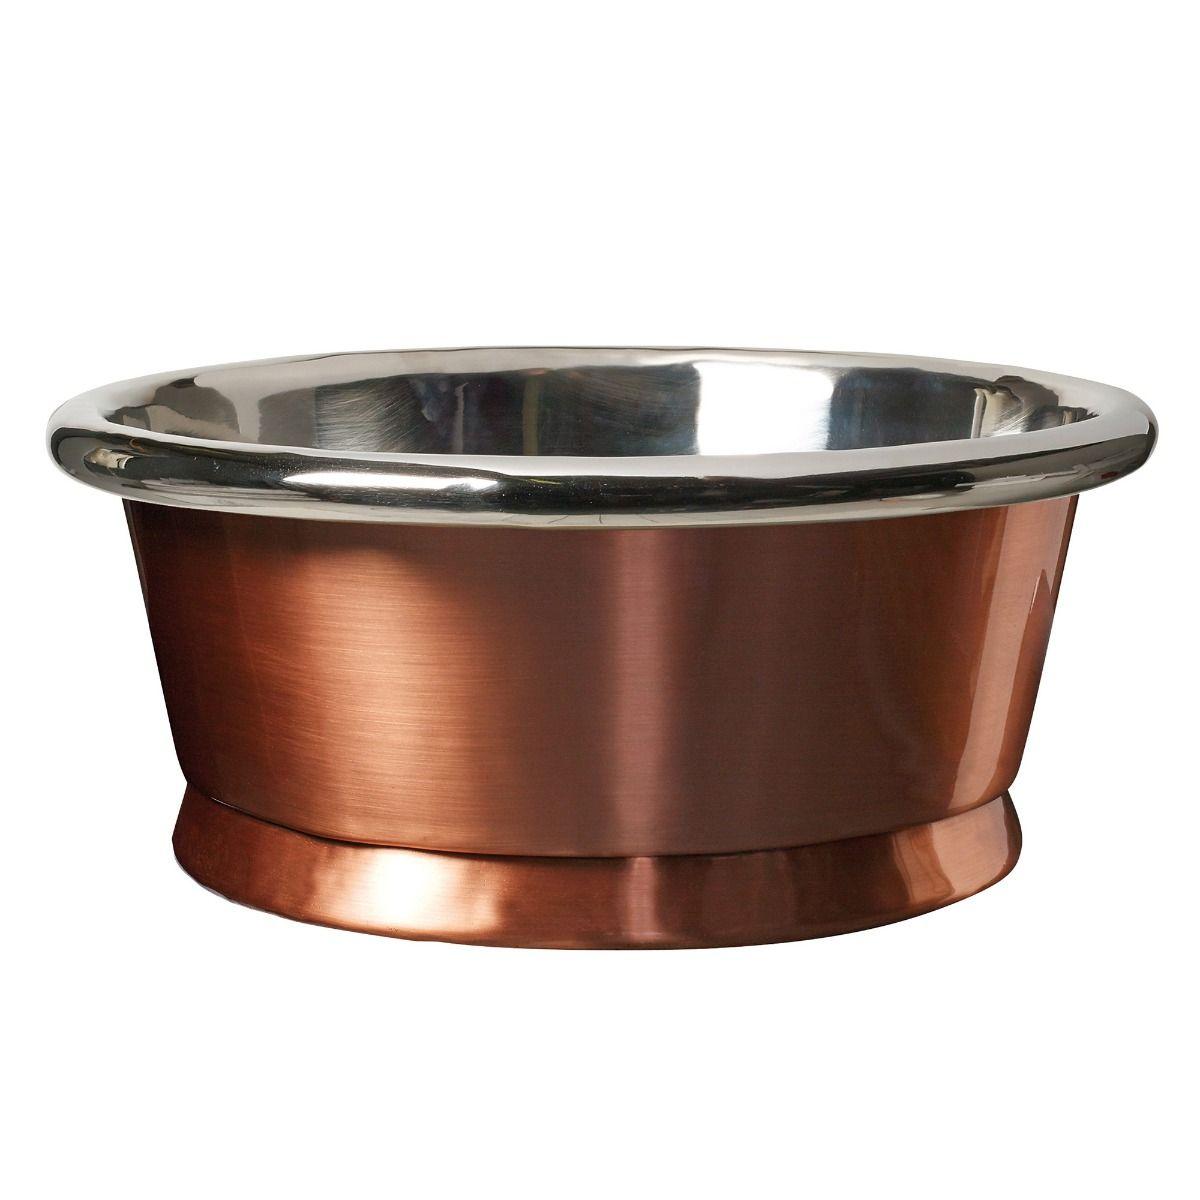 Kythera Copper Bowl